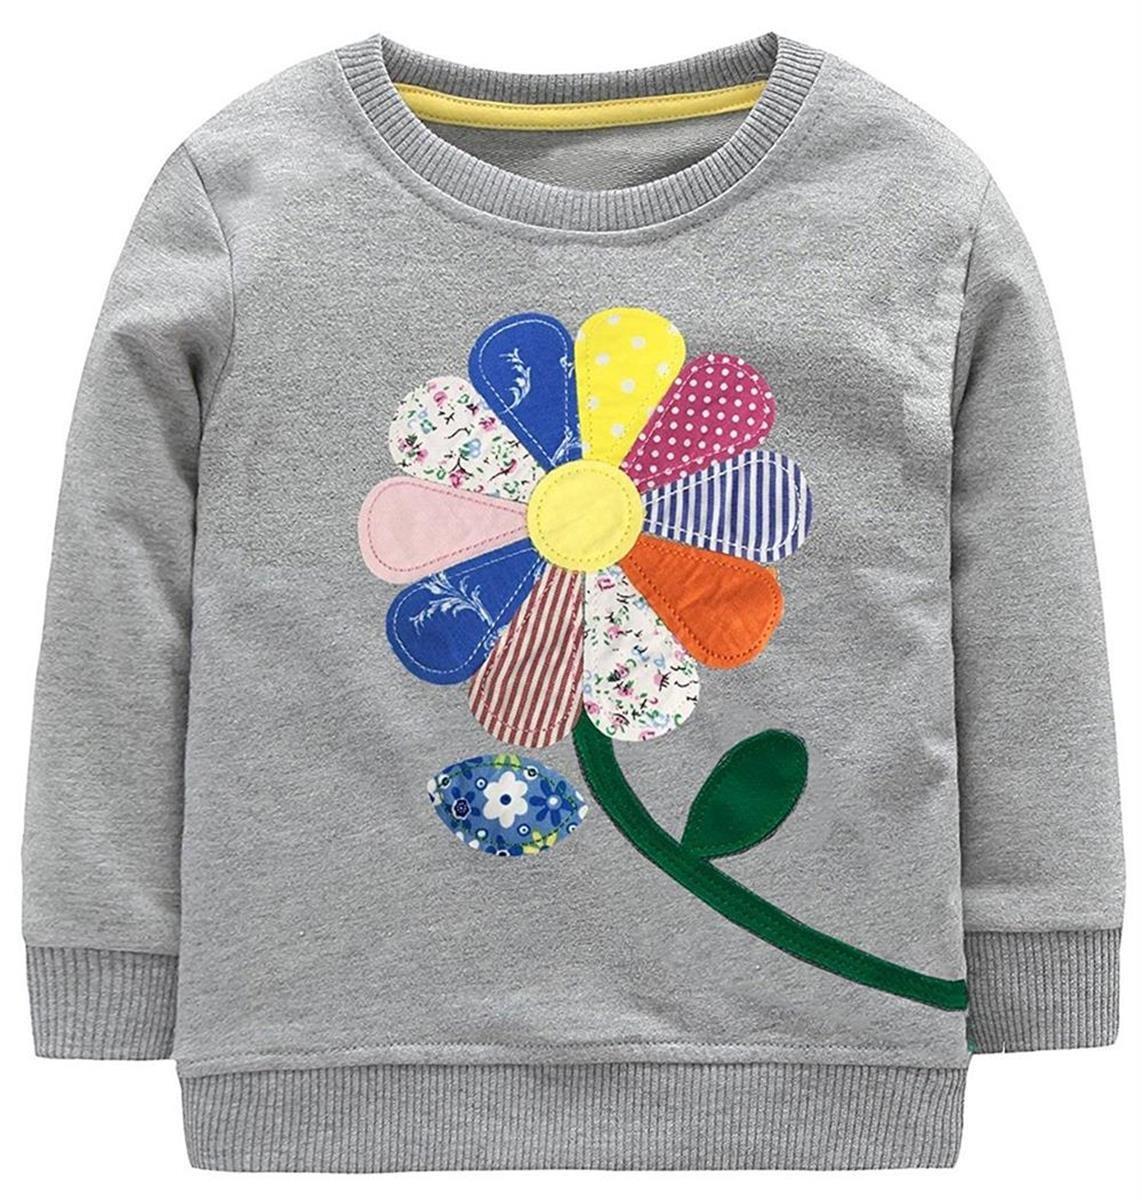 Guandiif Girl Cotton Sweatshirt Crewneck Pullover Cartoon Shirts Cute Long Sleeve Shirts Girl F 1-2 Years 110